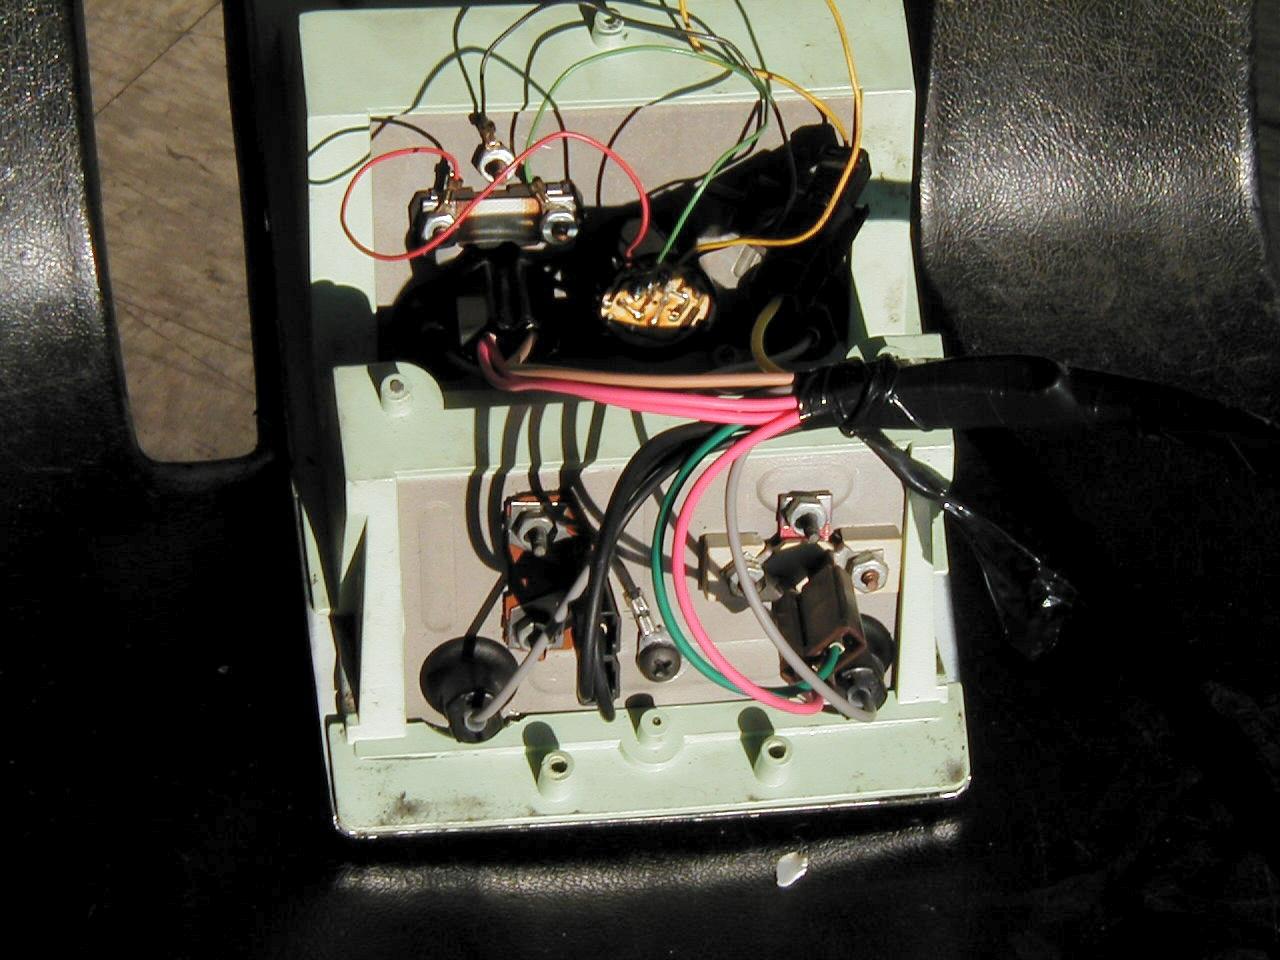 SW_0249] 68 Camaro Console Wiring Diagram Free DiagramHison Monoc Waro Isop Comin Exmet Wned Vira Tixat Mohammedshrine Librar  Wiring 101